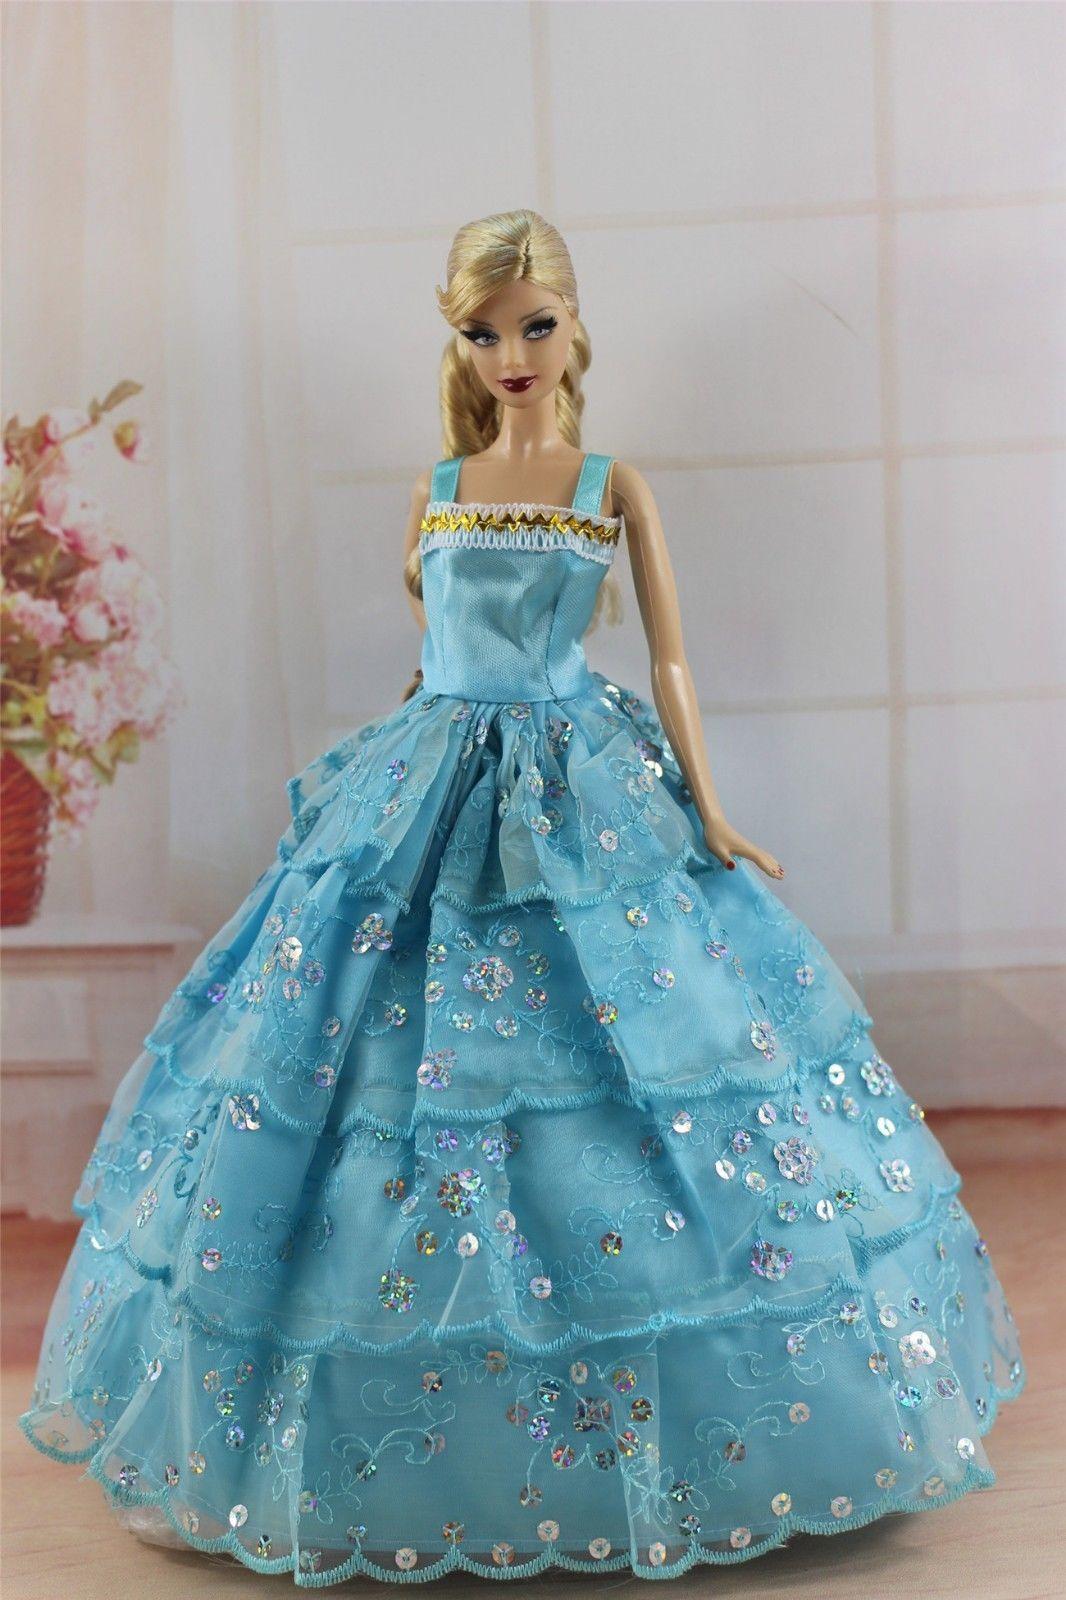 Blue Fashion Princess Dress Wedding Clothes/Gown For Barbie Doll ...